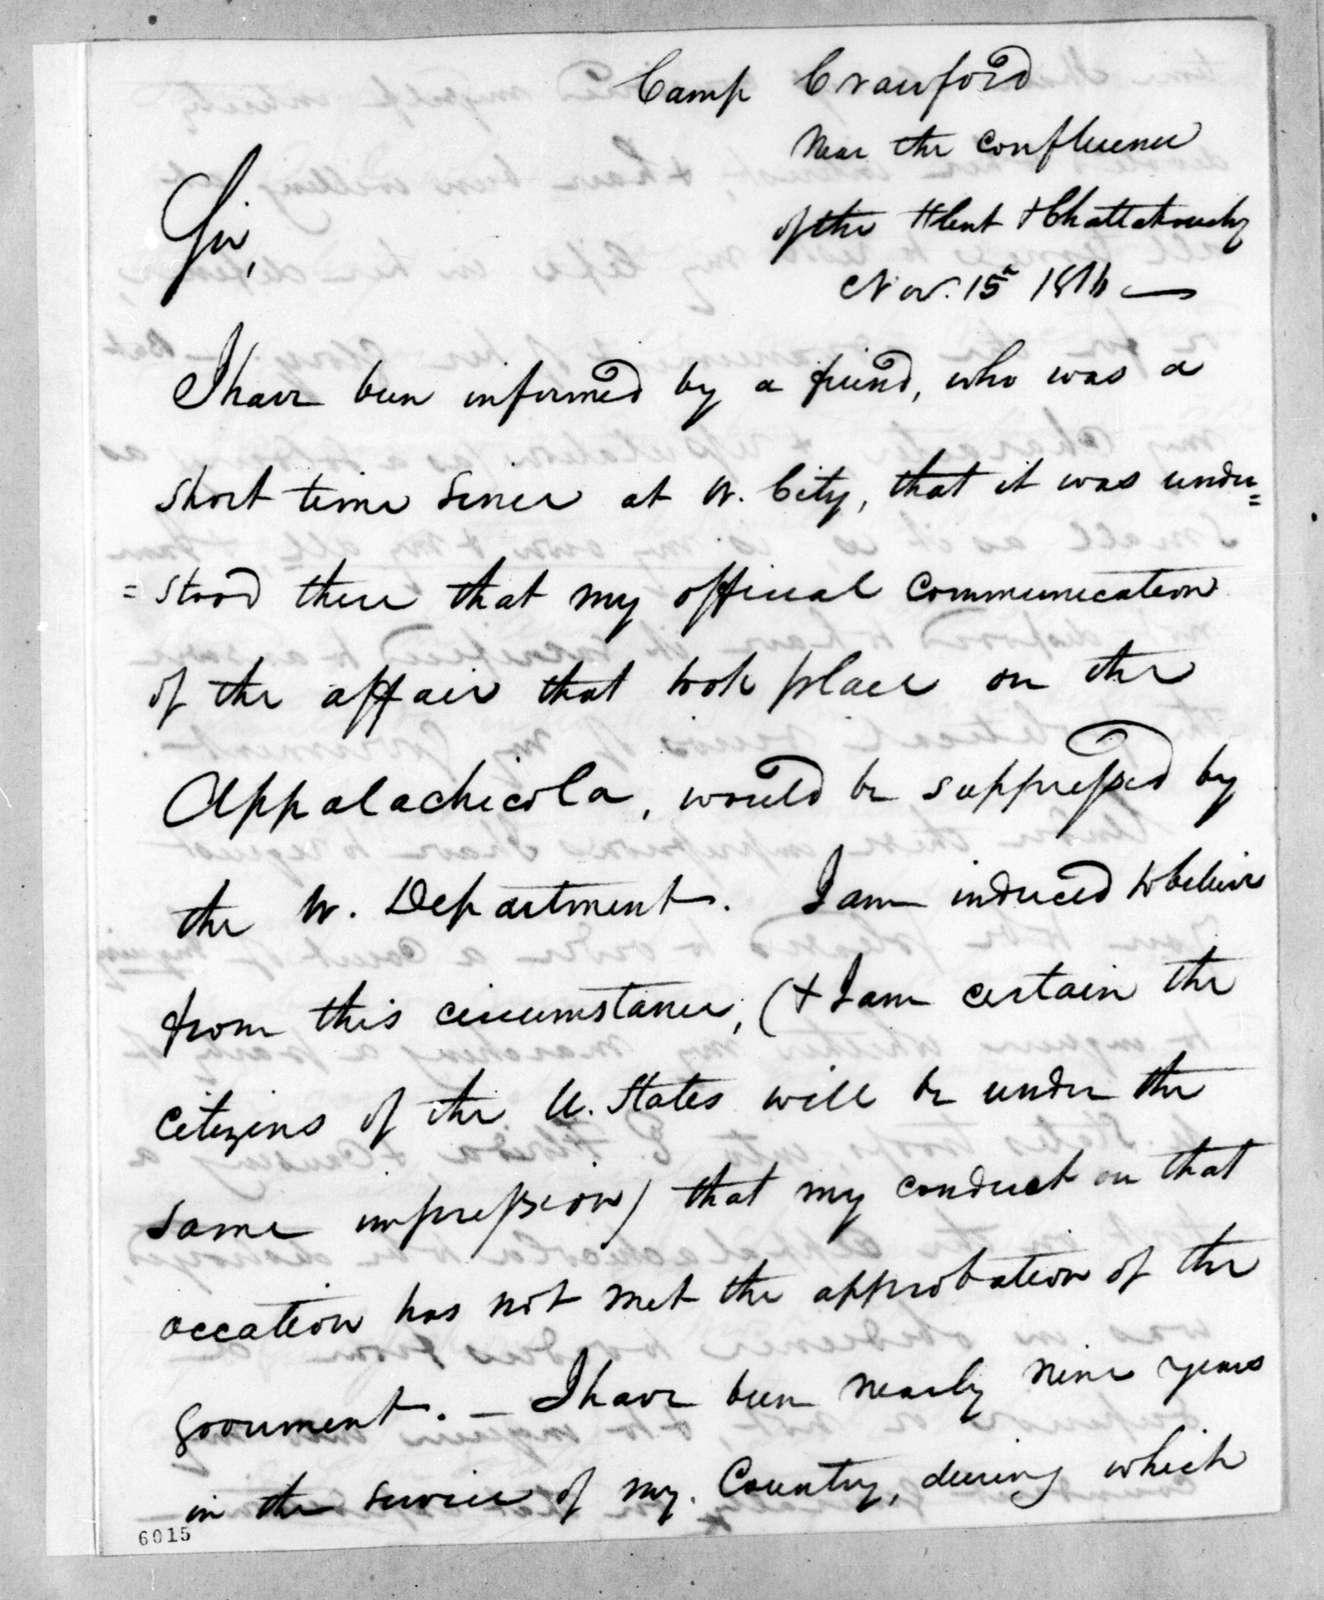 Duncan Lamont Clinch to Andrew Jackson, November 15, 1816